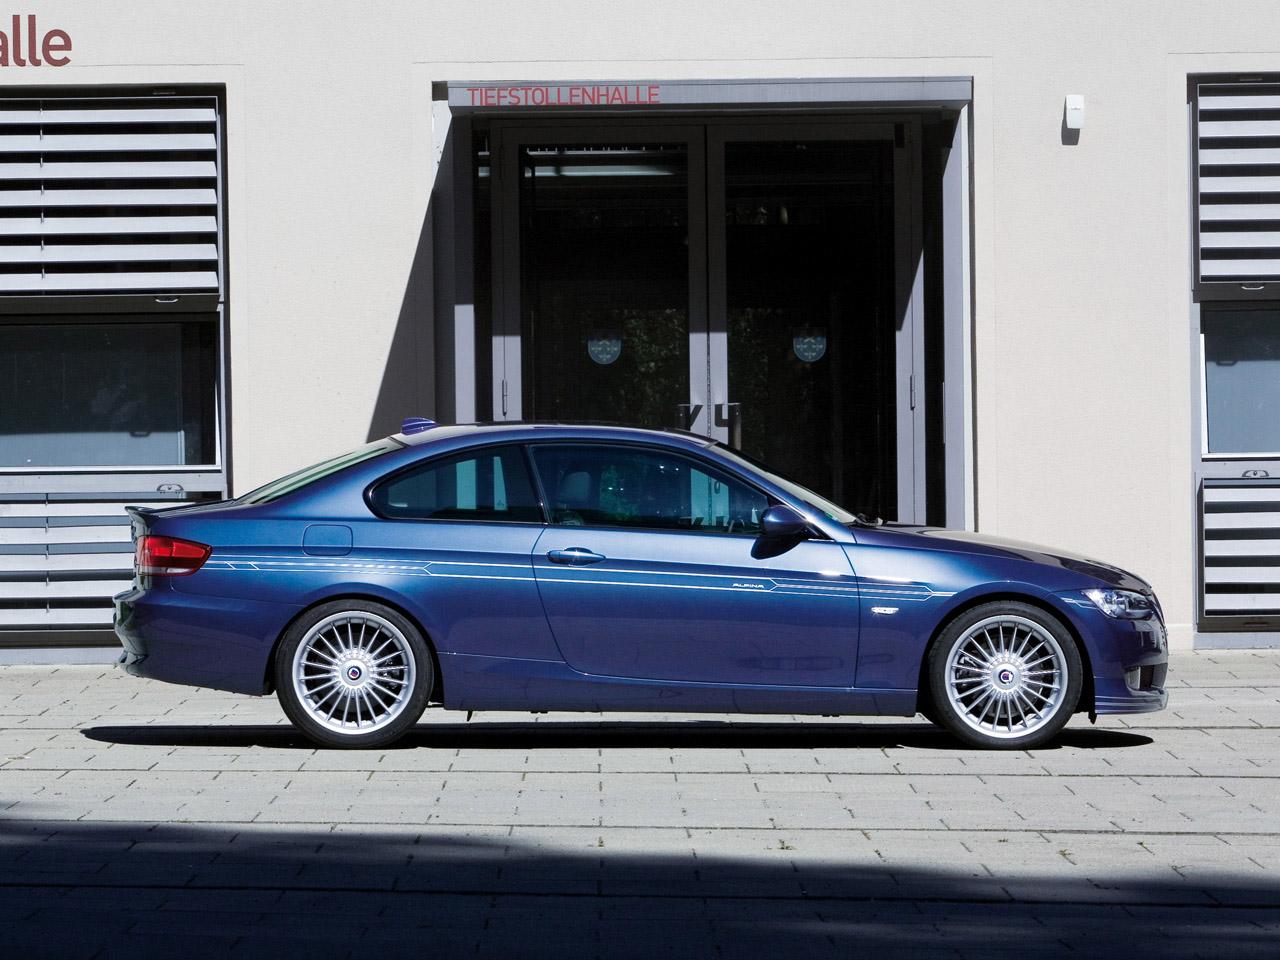 Bmw Alpina Releases 215 Hp D3 Biturbo Autoevolution